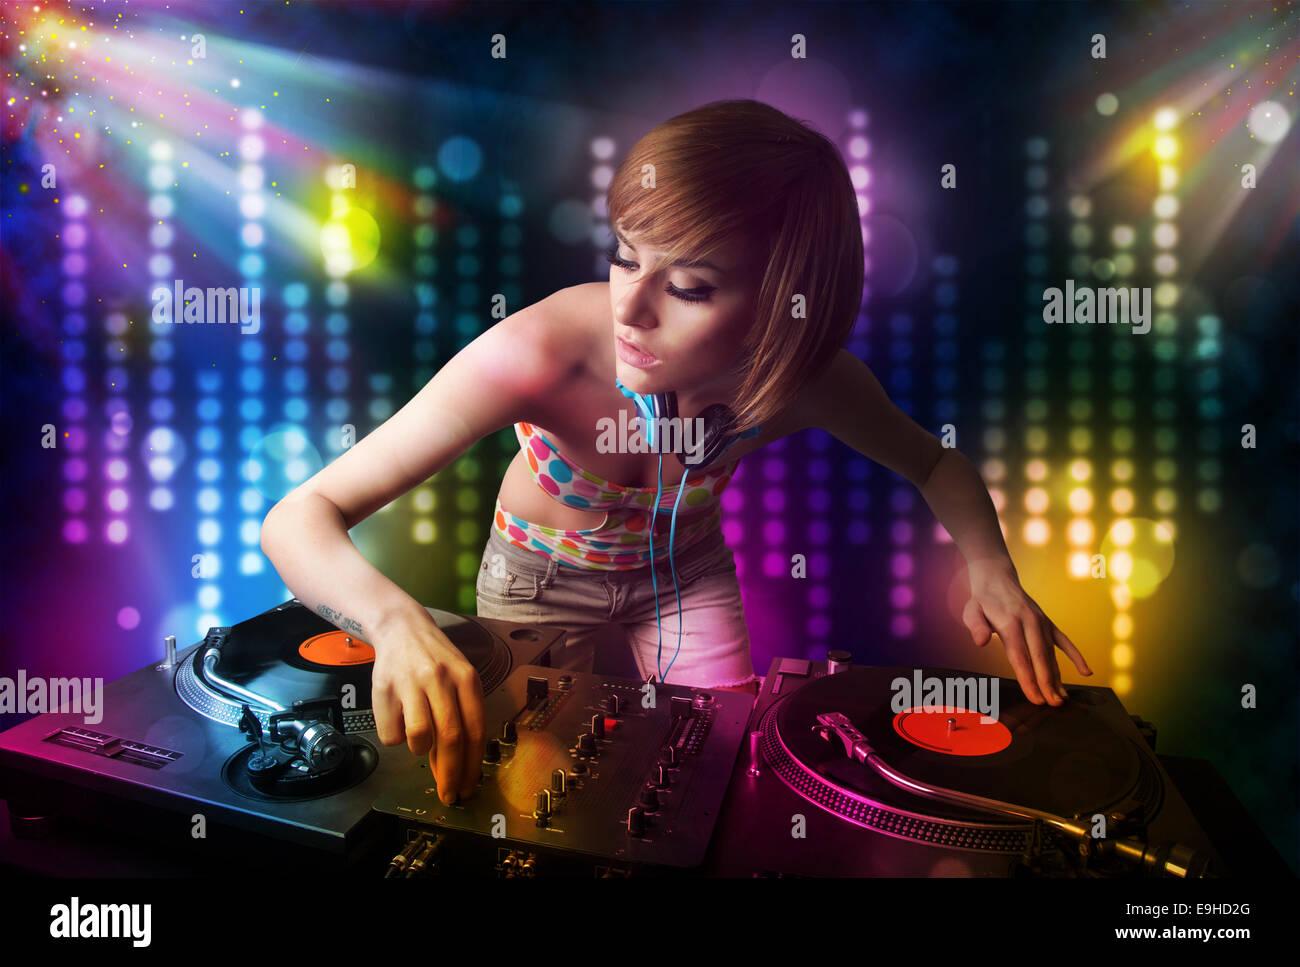 Headphones Brunette girl DJ deejay Girls Music 2560x1700